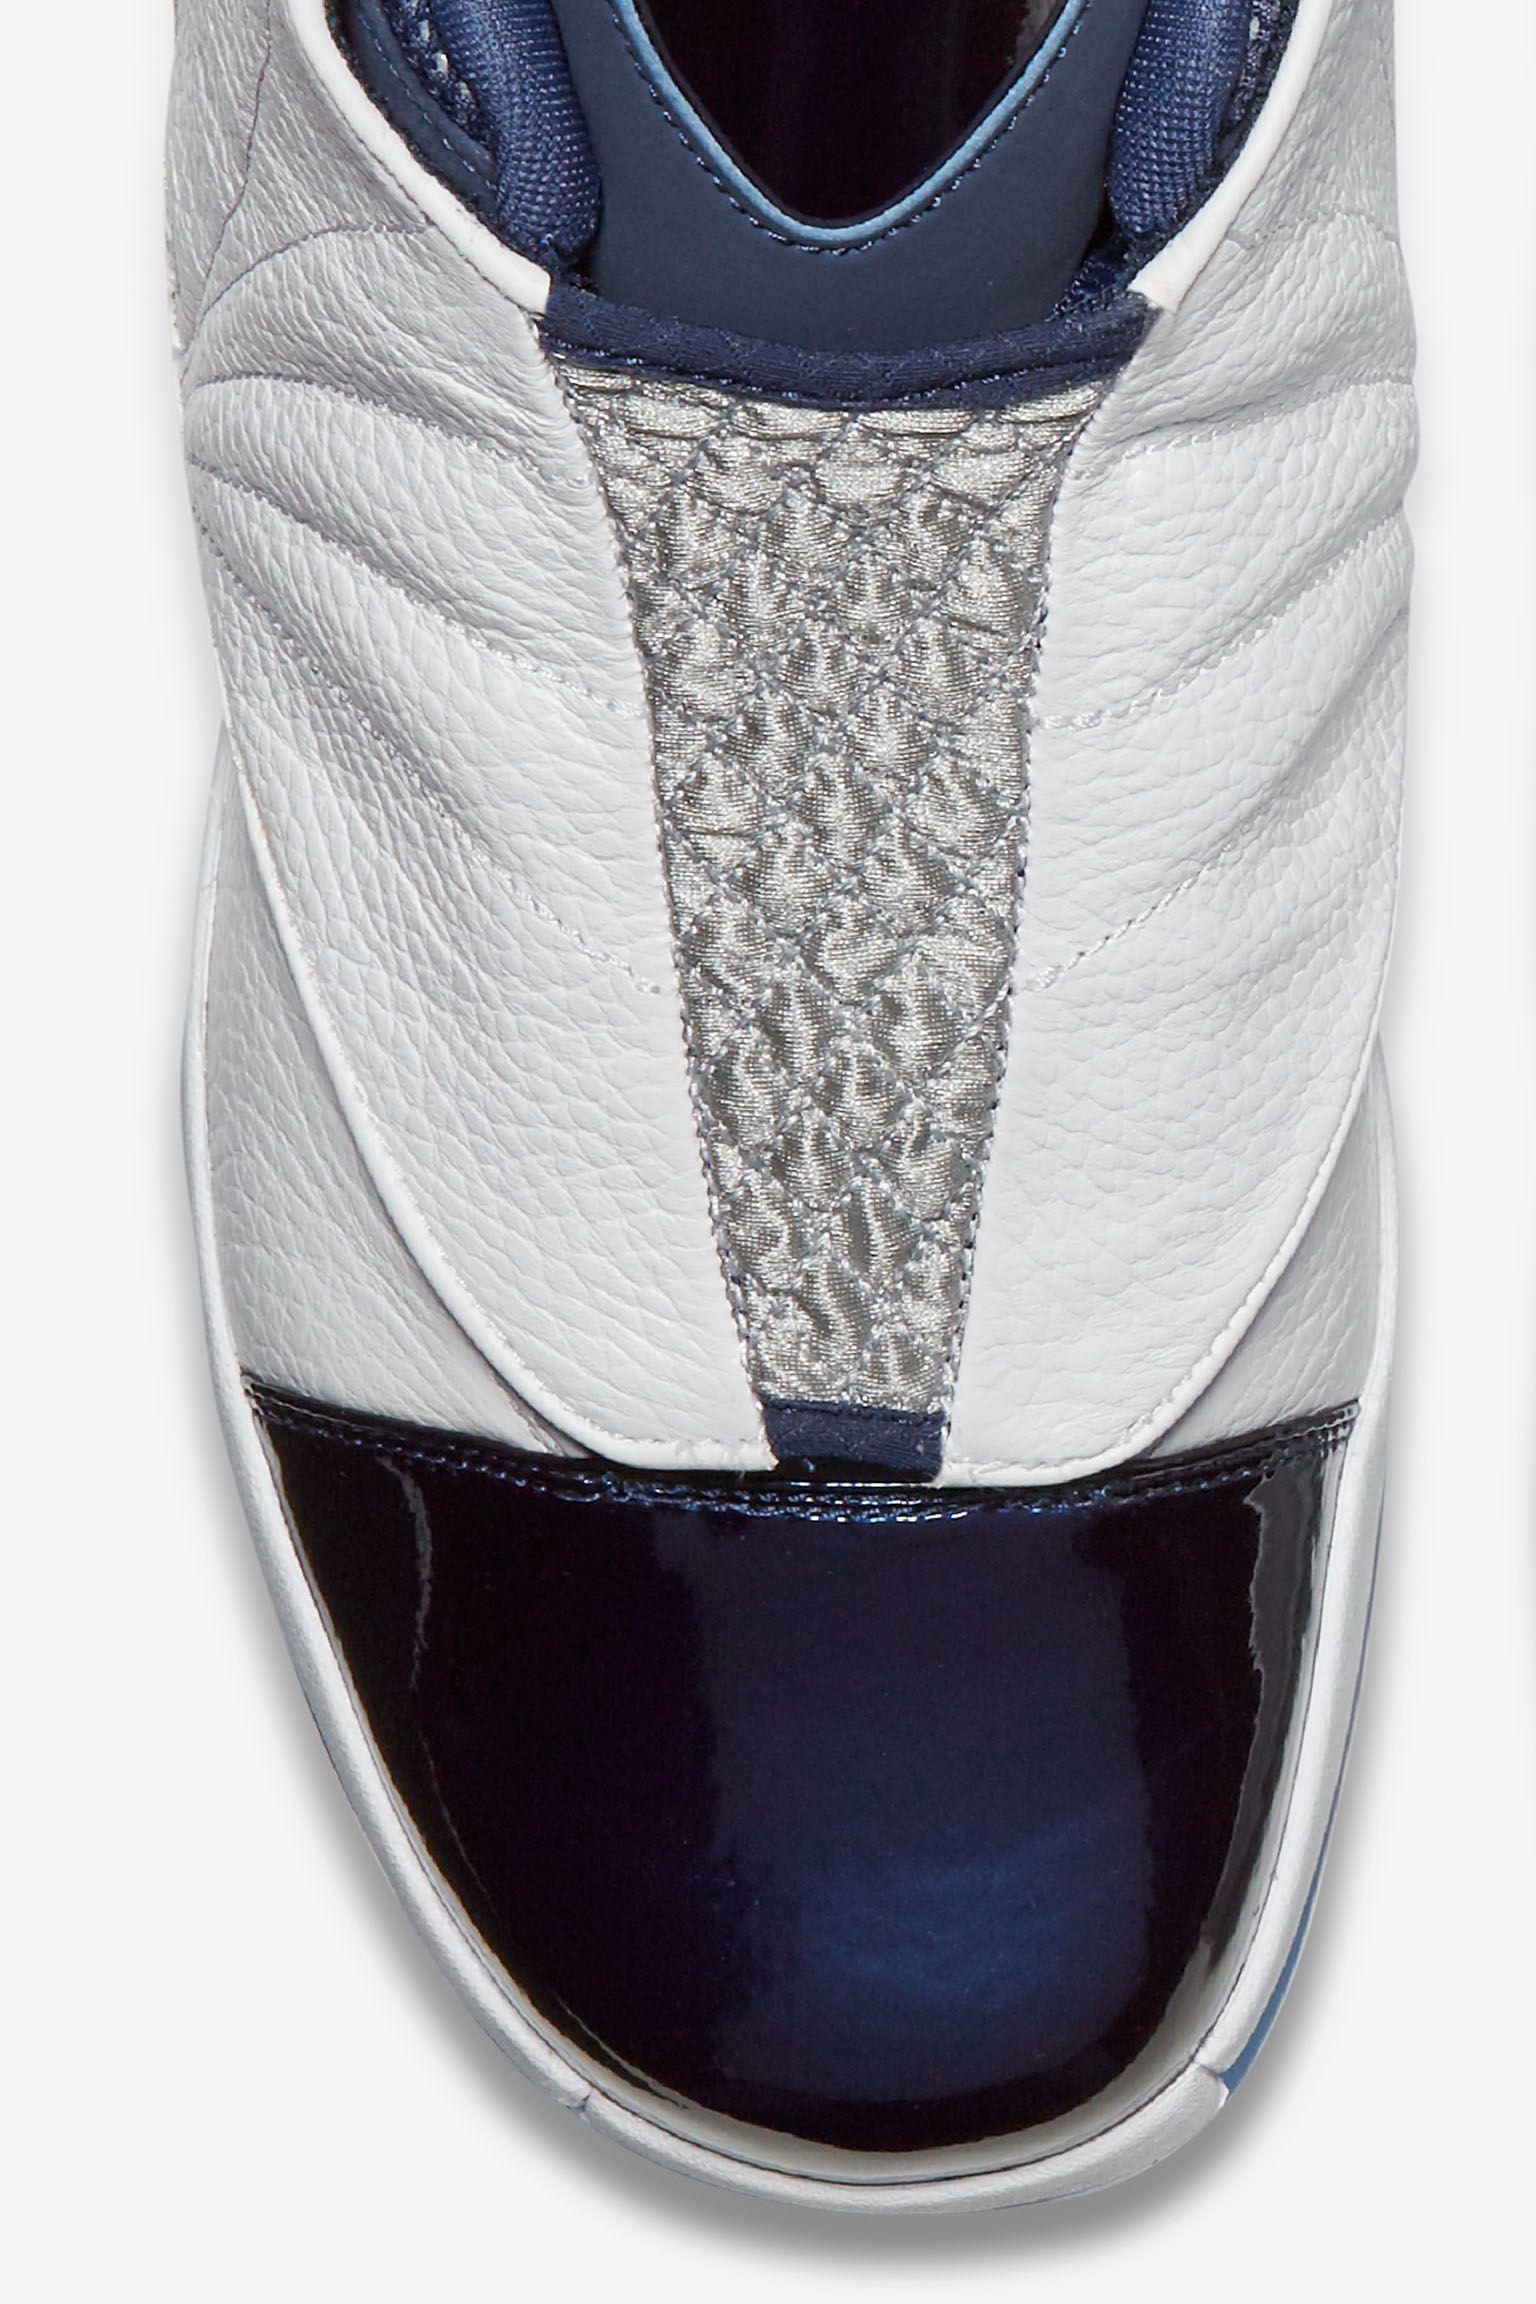 Air Jordan 16 Retro 'Midnight Navy & White'